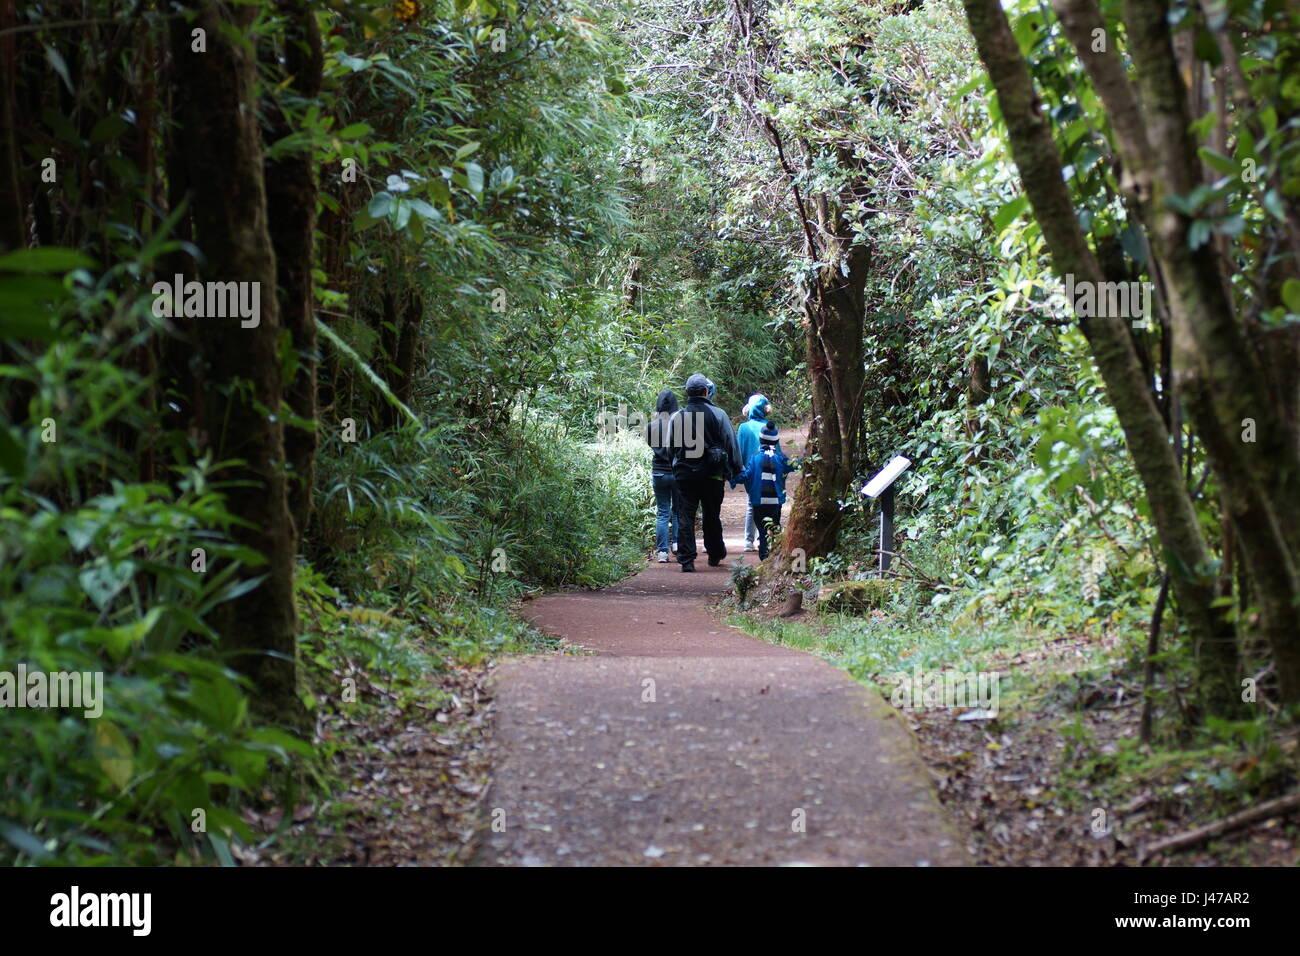 Tourist trail on the Poas volcano. Parque Nacional Volcan Poas. Costa Rica, Alajuela Province, Poas Volcano. 29th - Stock Image